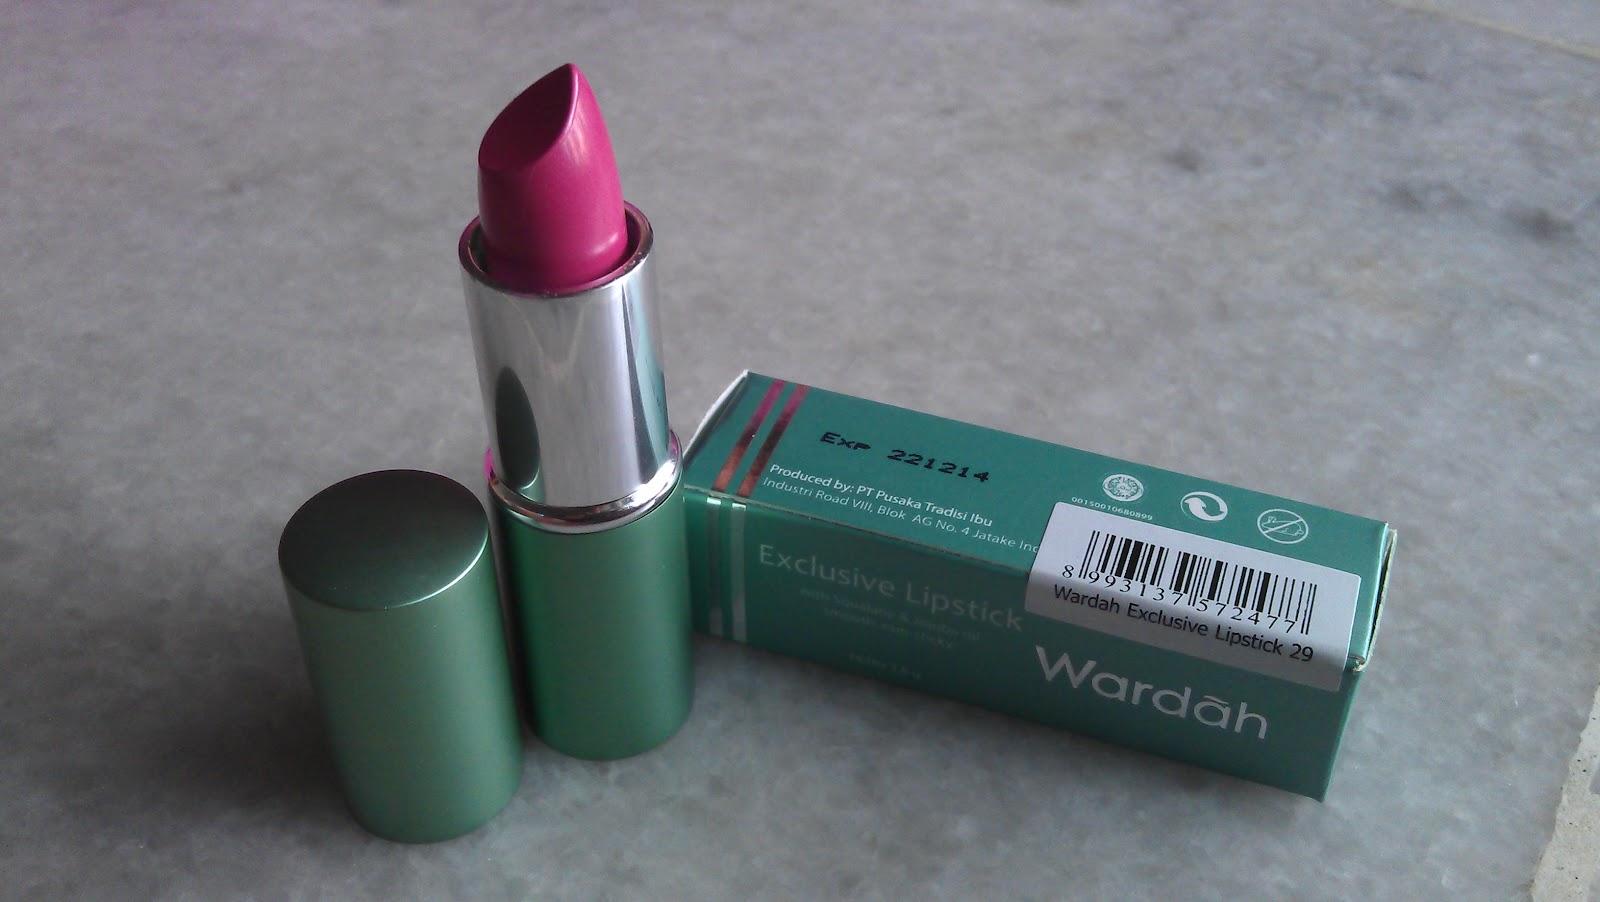 WARDAH Johor Skincare & Cosmetic: Exclusive Series(Cosmetic)